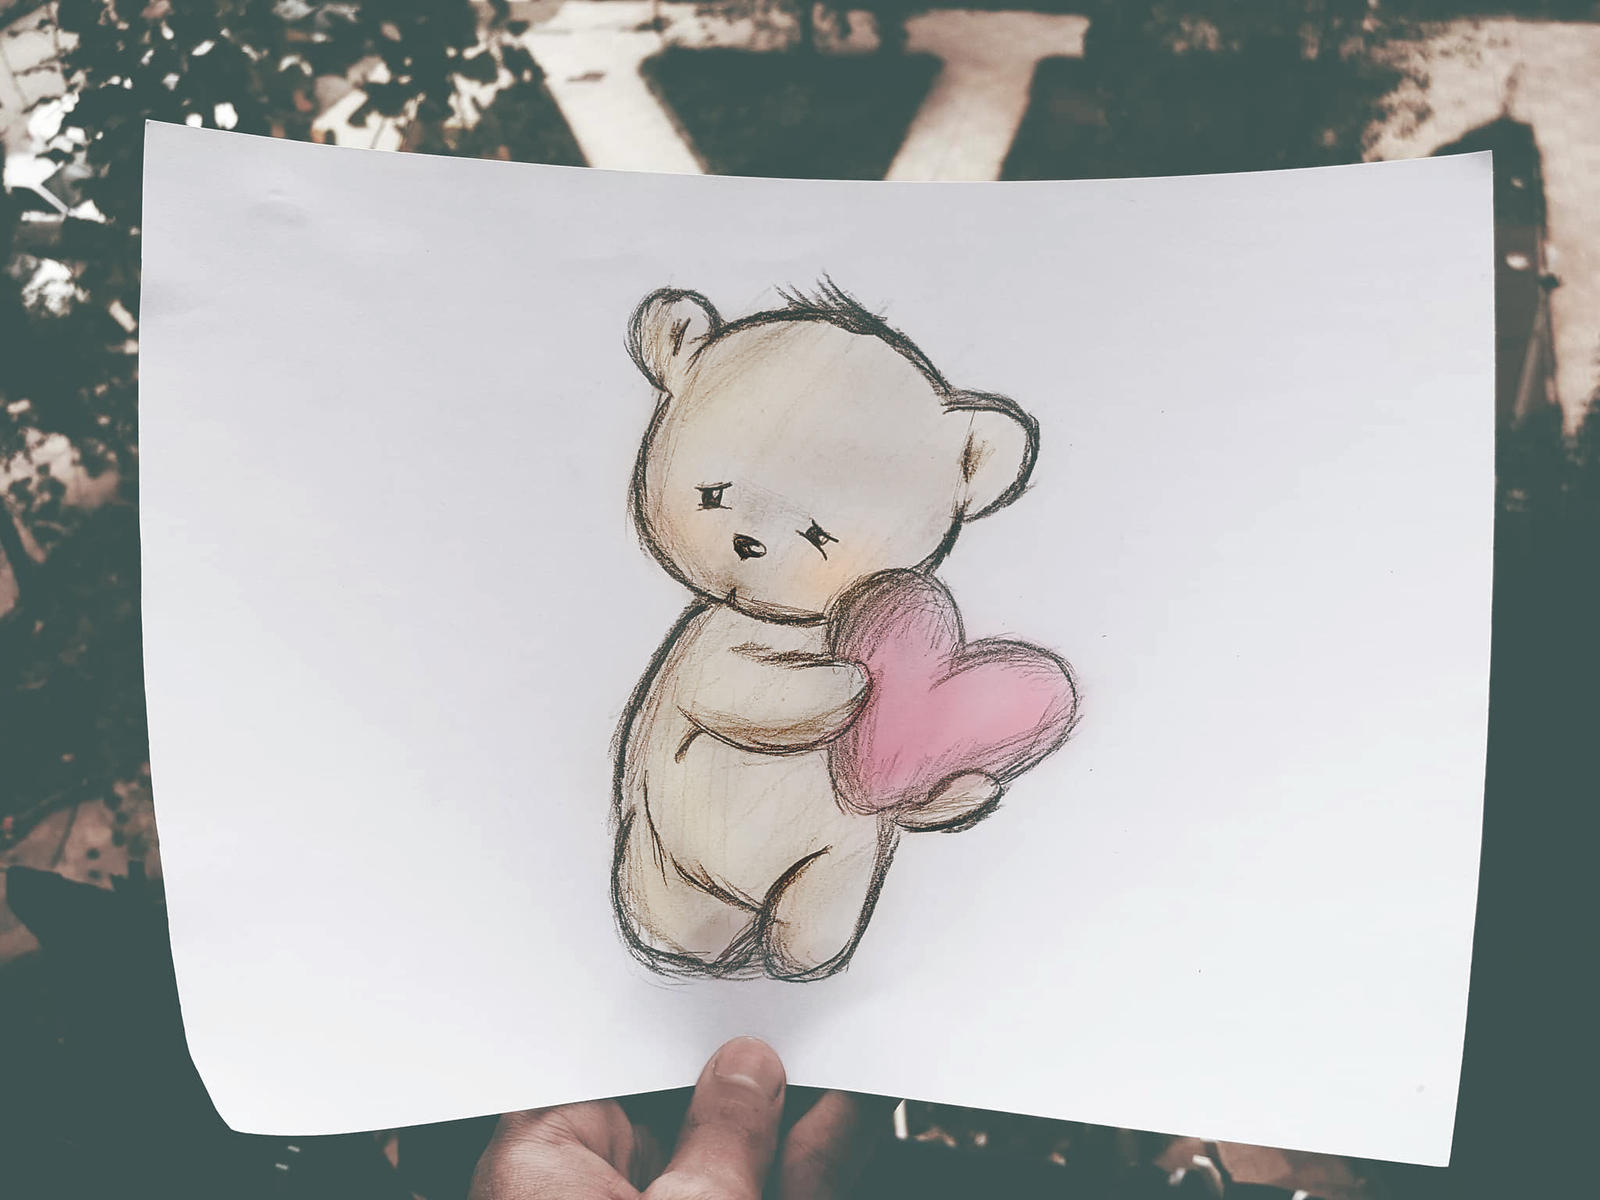 Sad Loving TeddyBear by KhaledReese